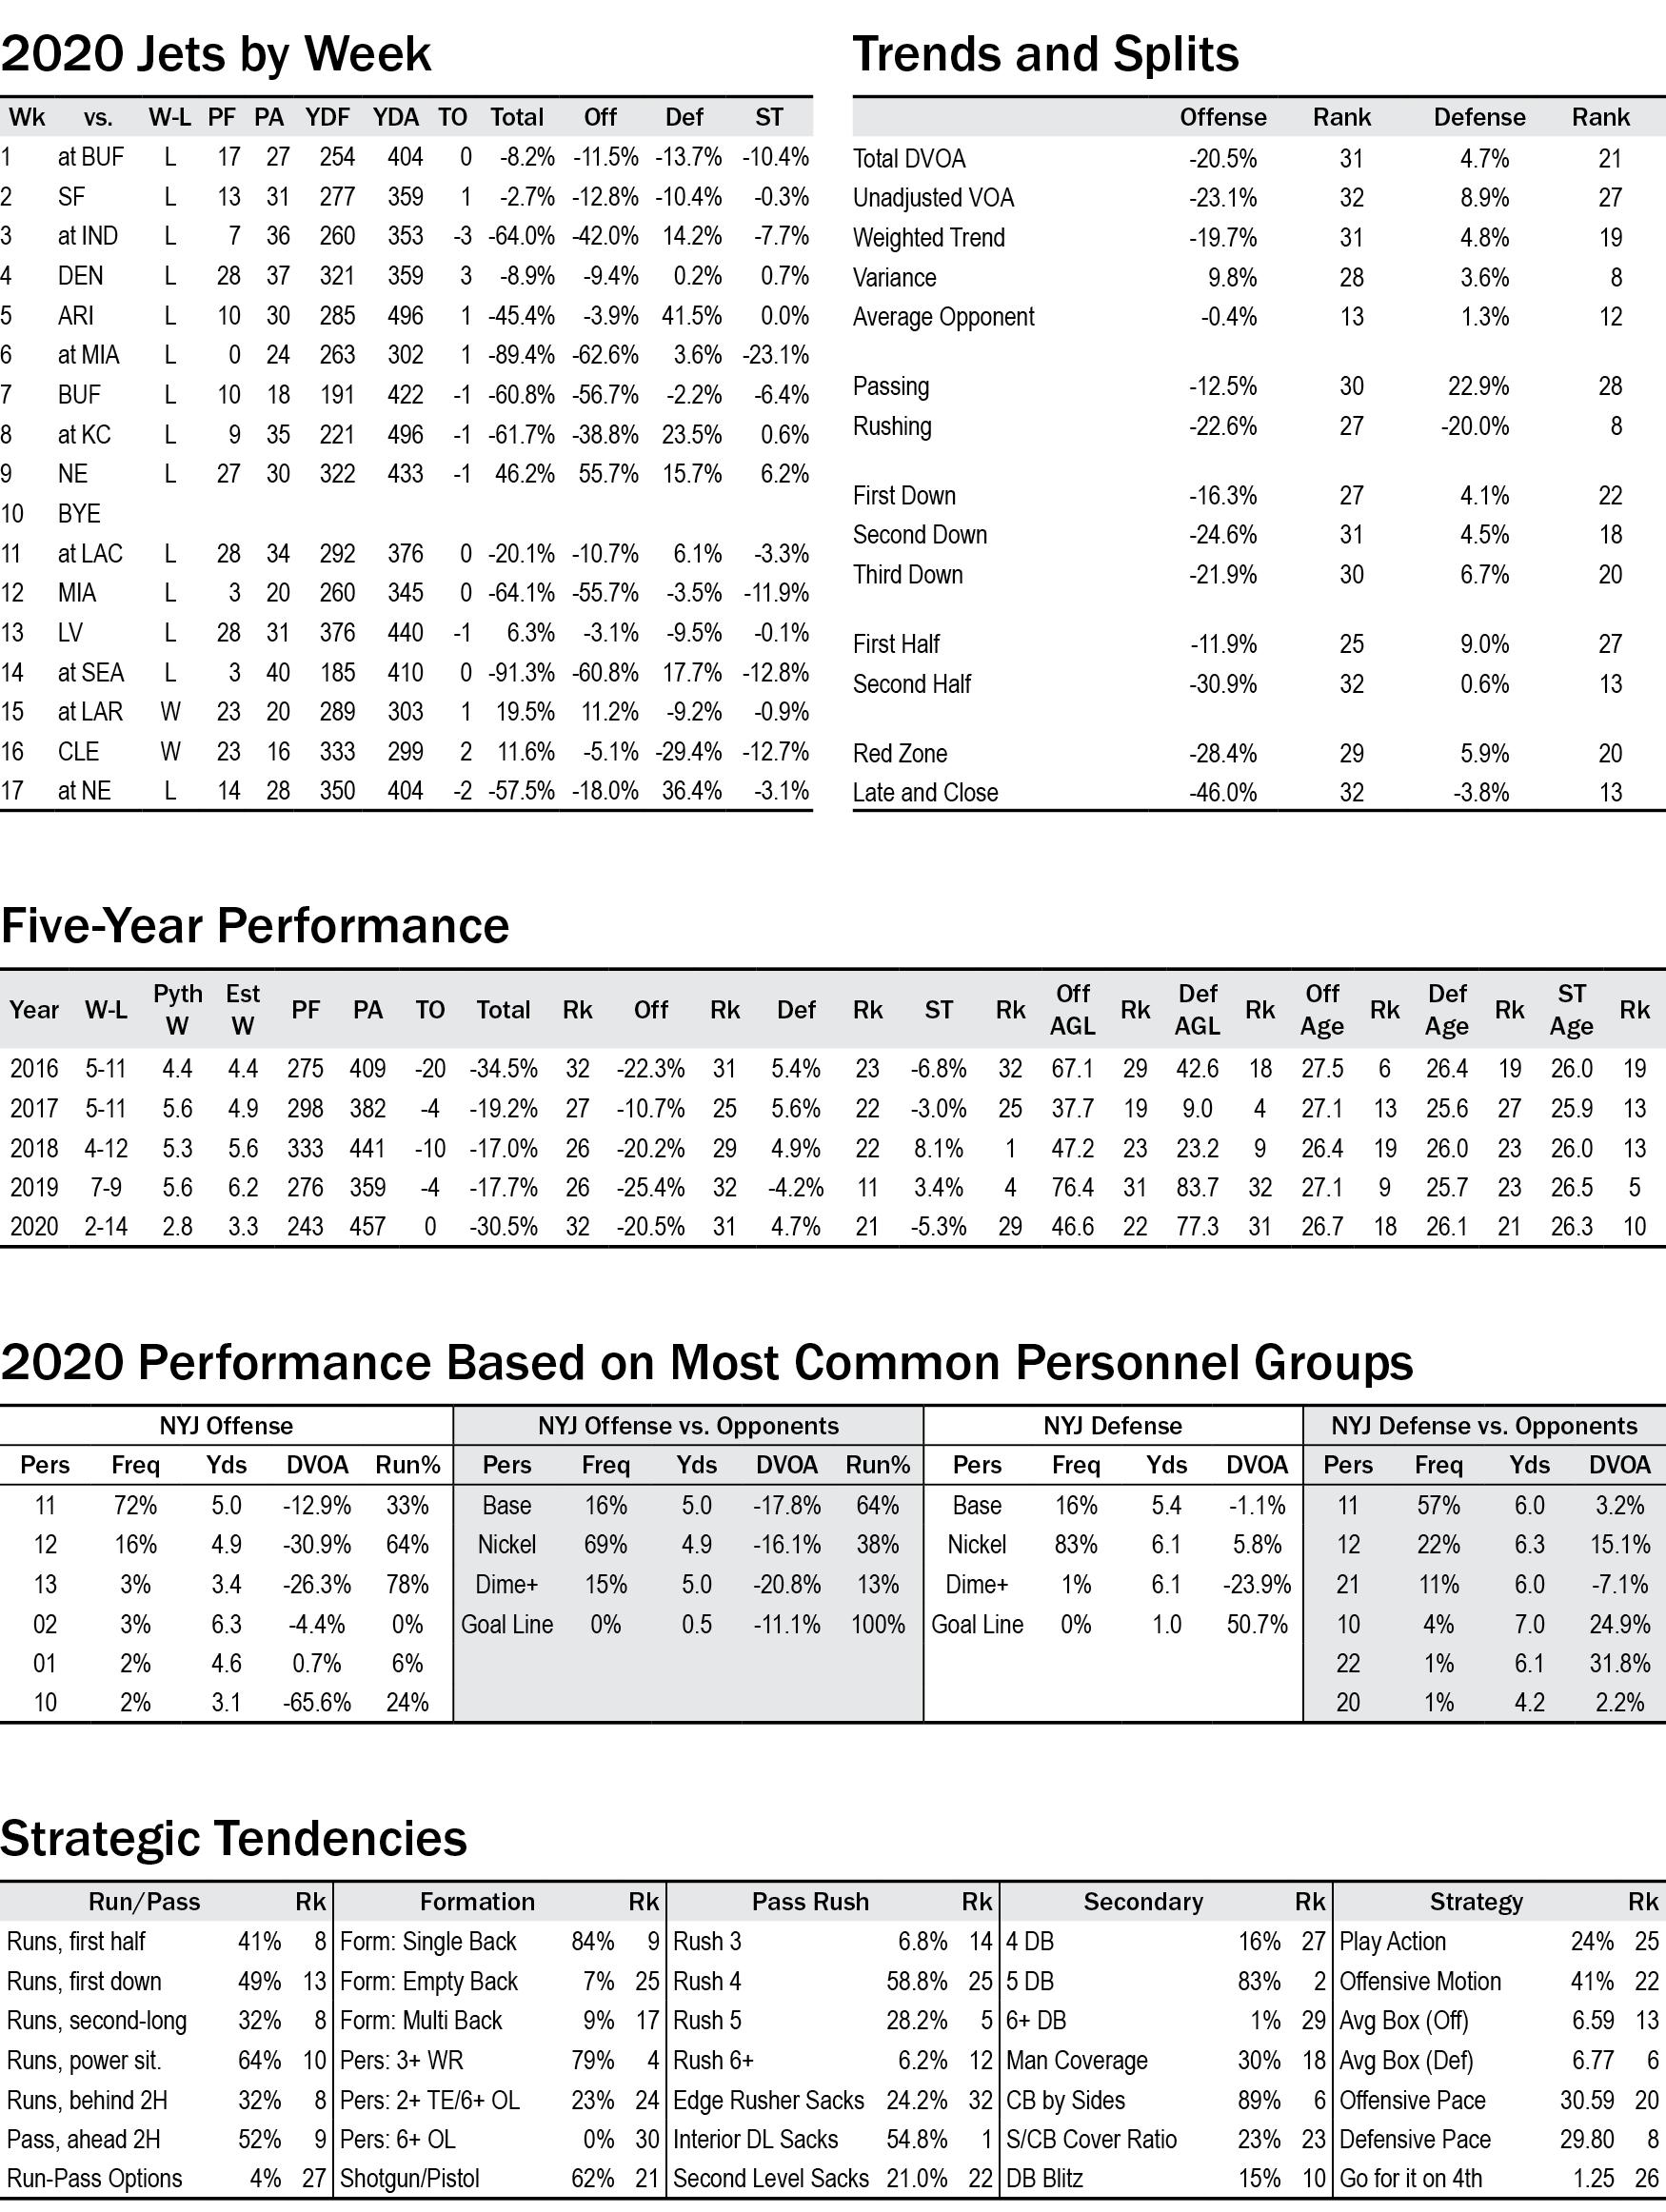 Football Outsiders Almanac 2021 New York Jets